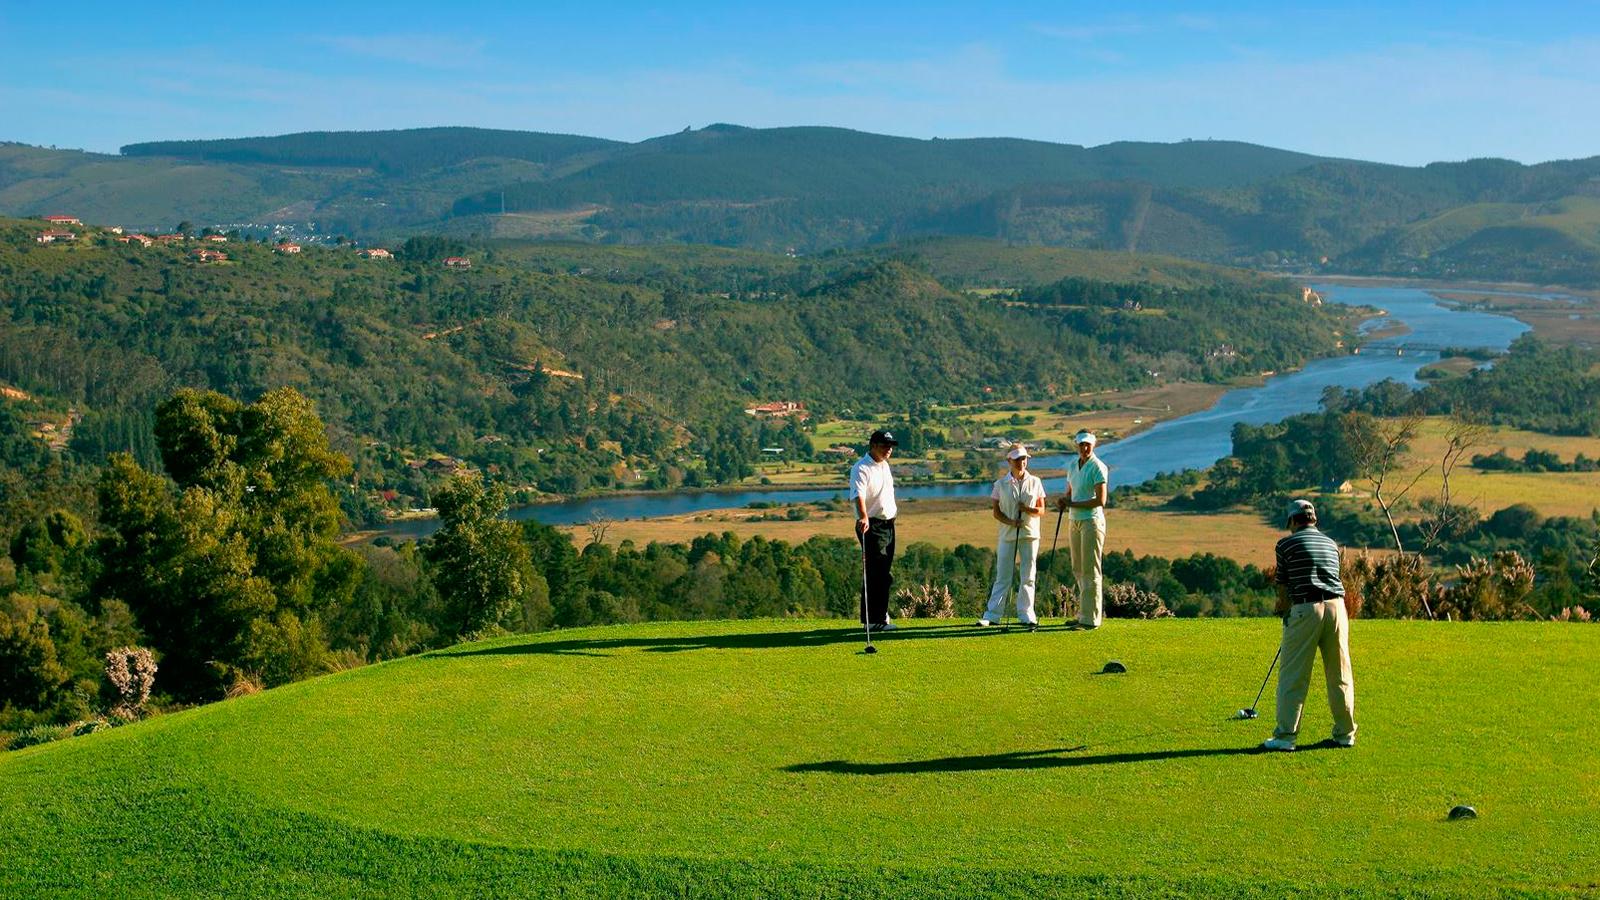 Simola Golf Course Zuid-Afrika